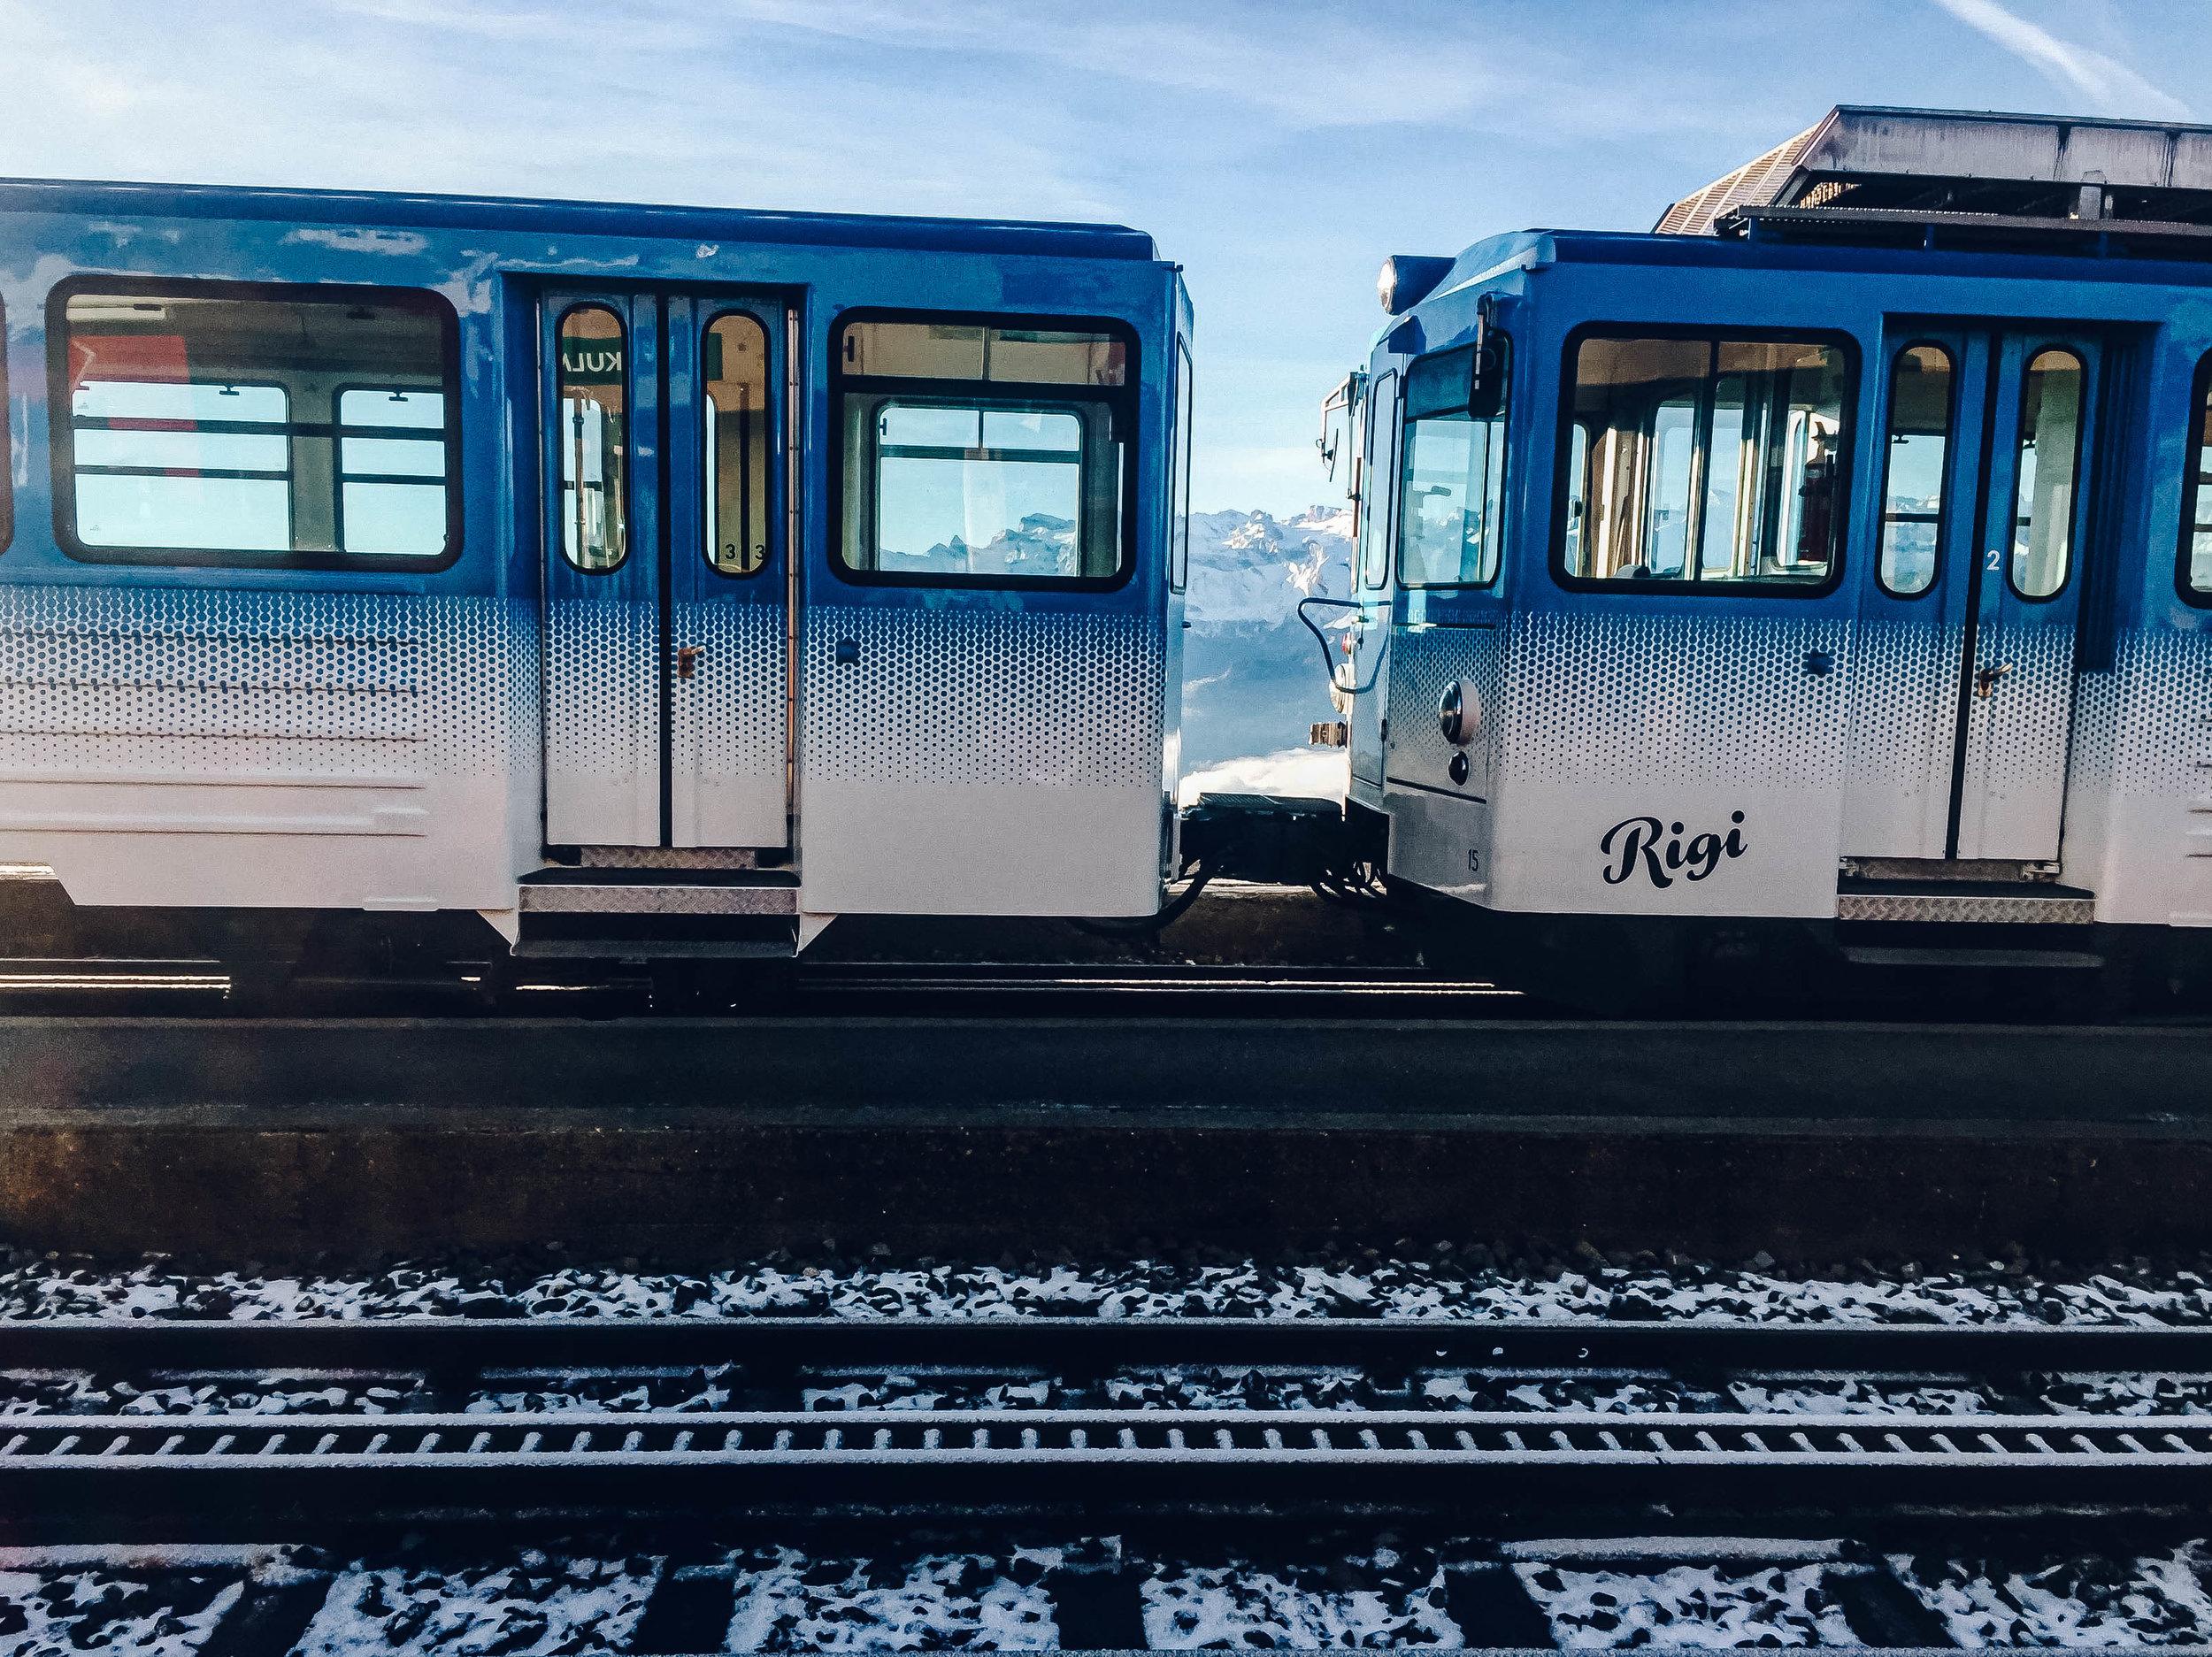 Rigi Bahn on Rigi Kulm in Switzerland